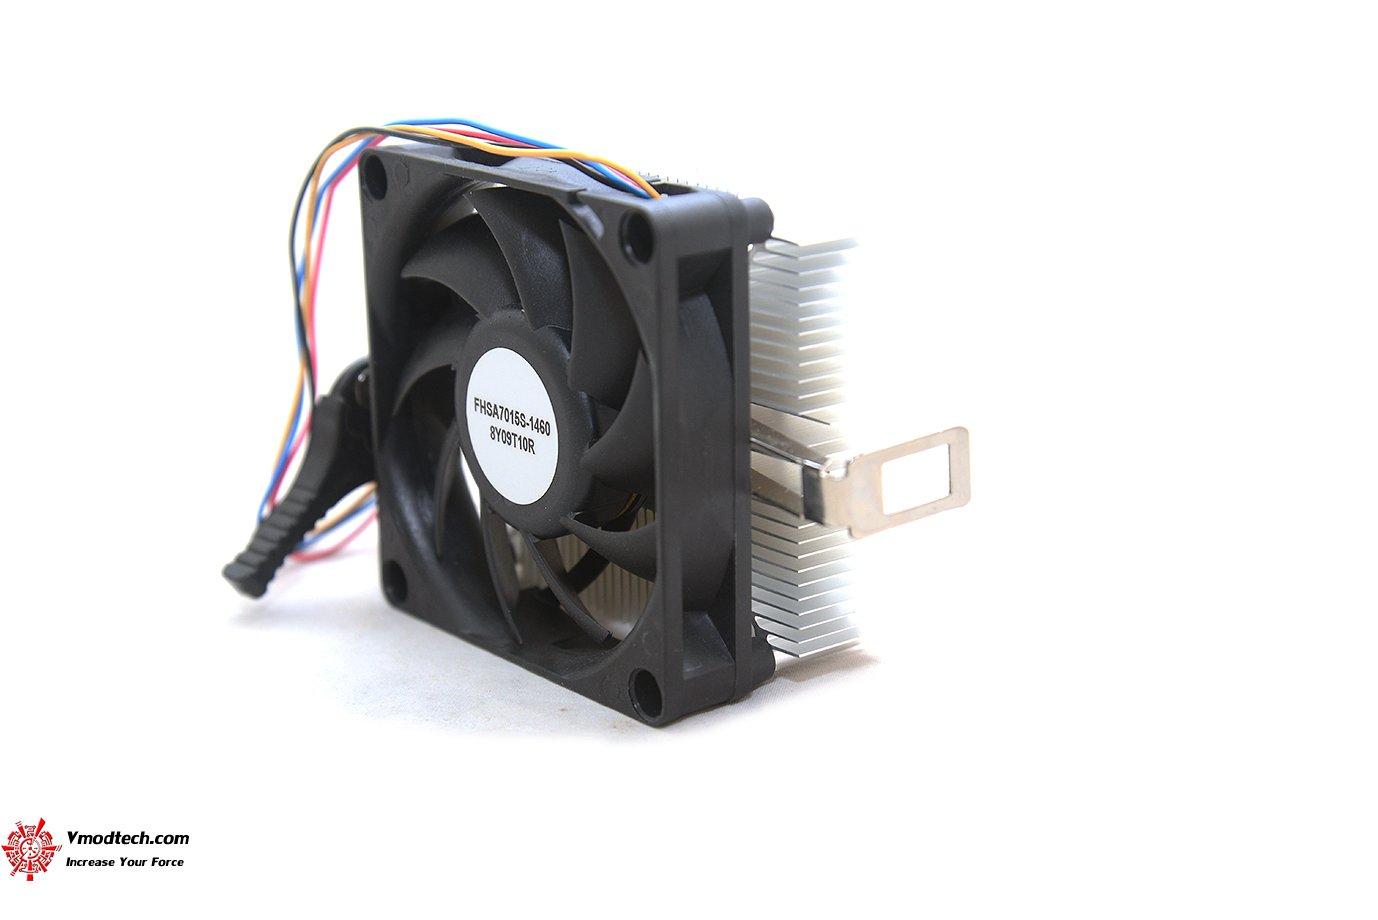 dsc 9682 AMD Athlon 220GE Processor with Radeon Vega 3 Graphics Review